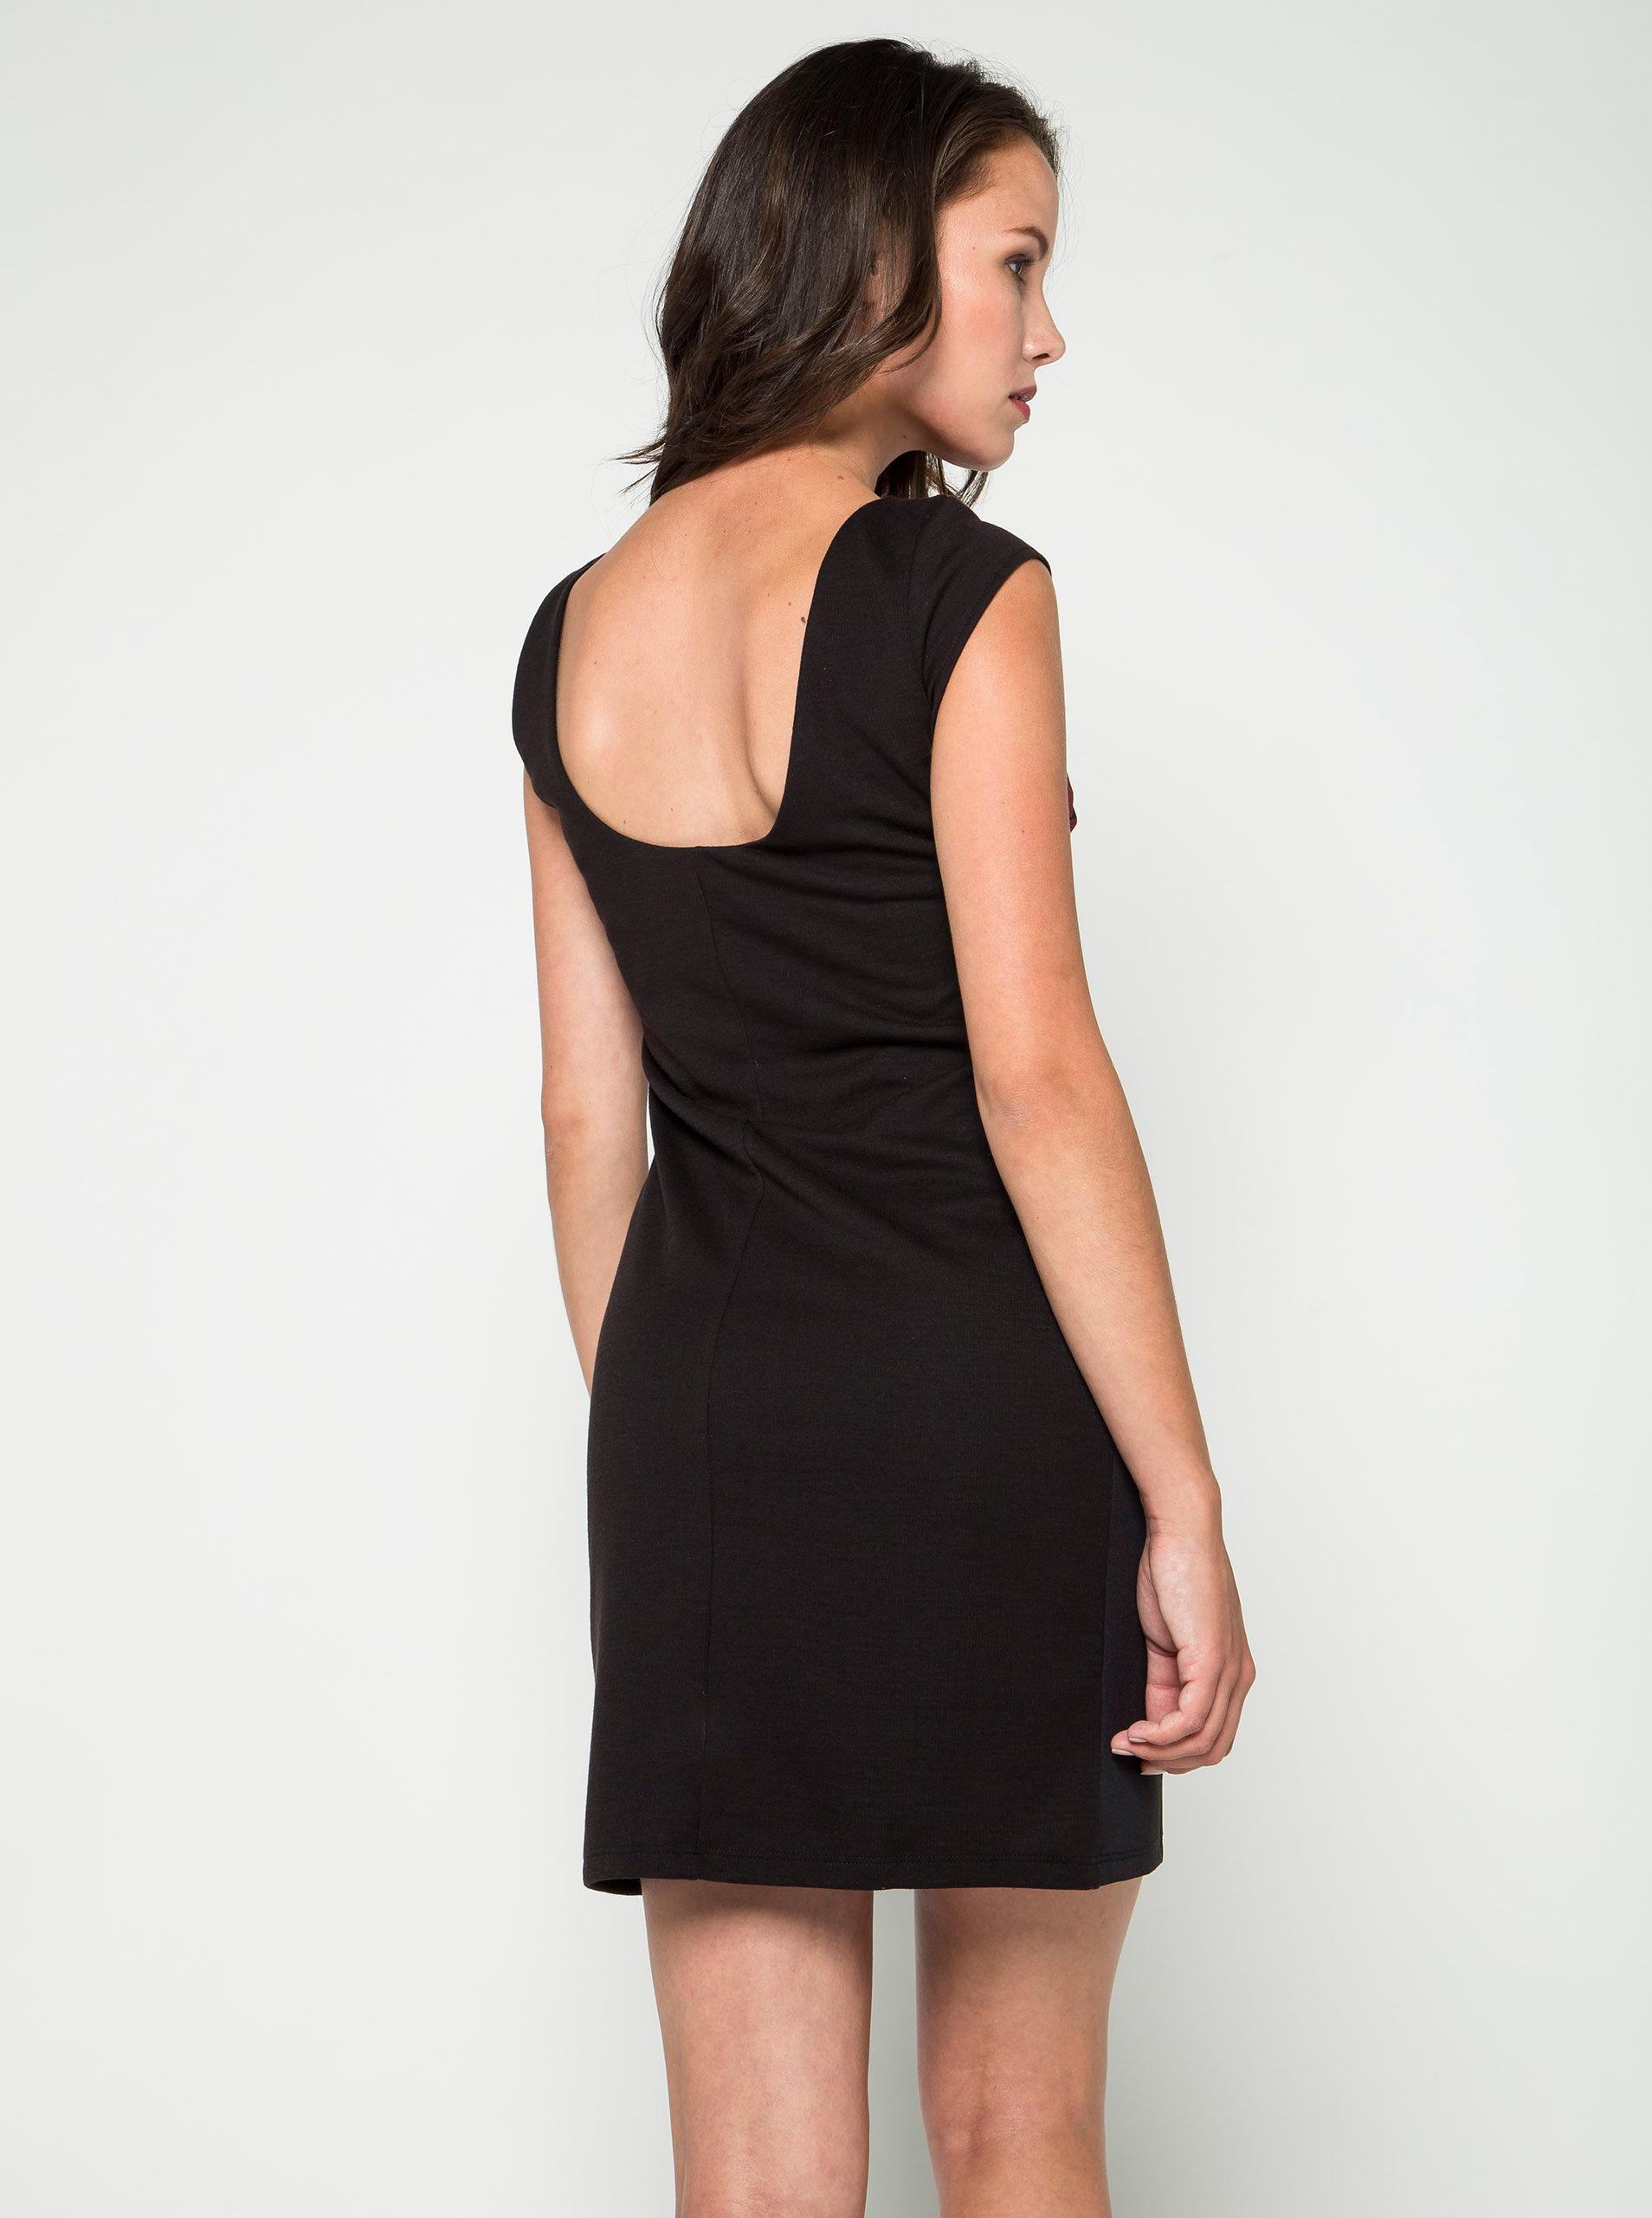 Čierne puzdrové kvetované šaty Desigual Ulianne ... 5d4d1349d44